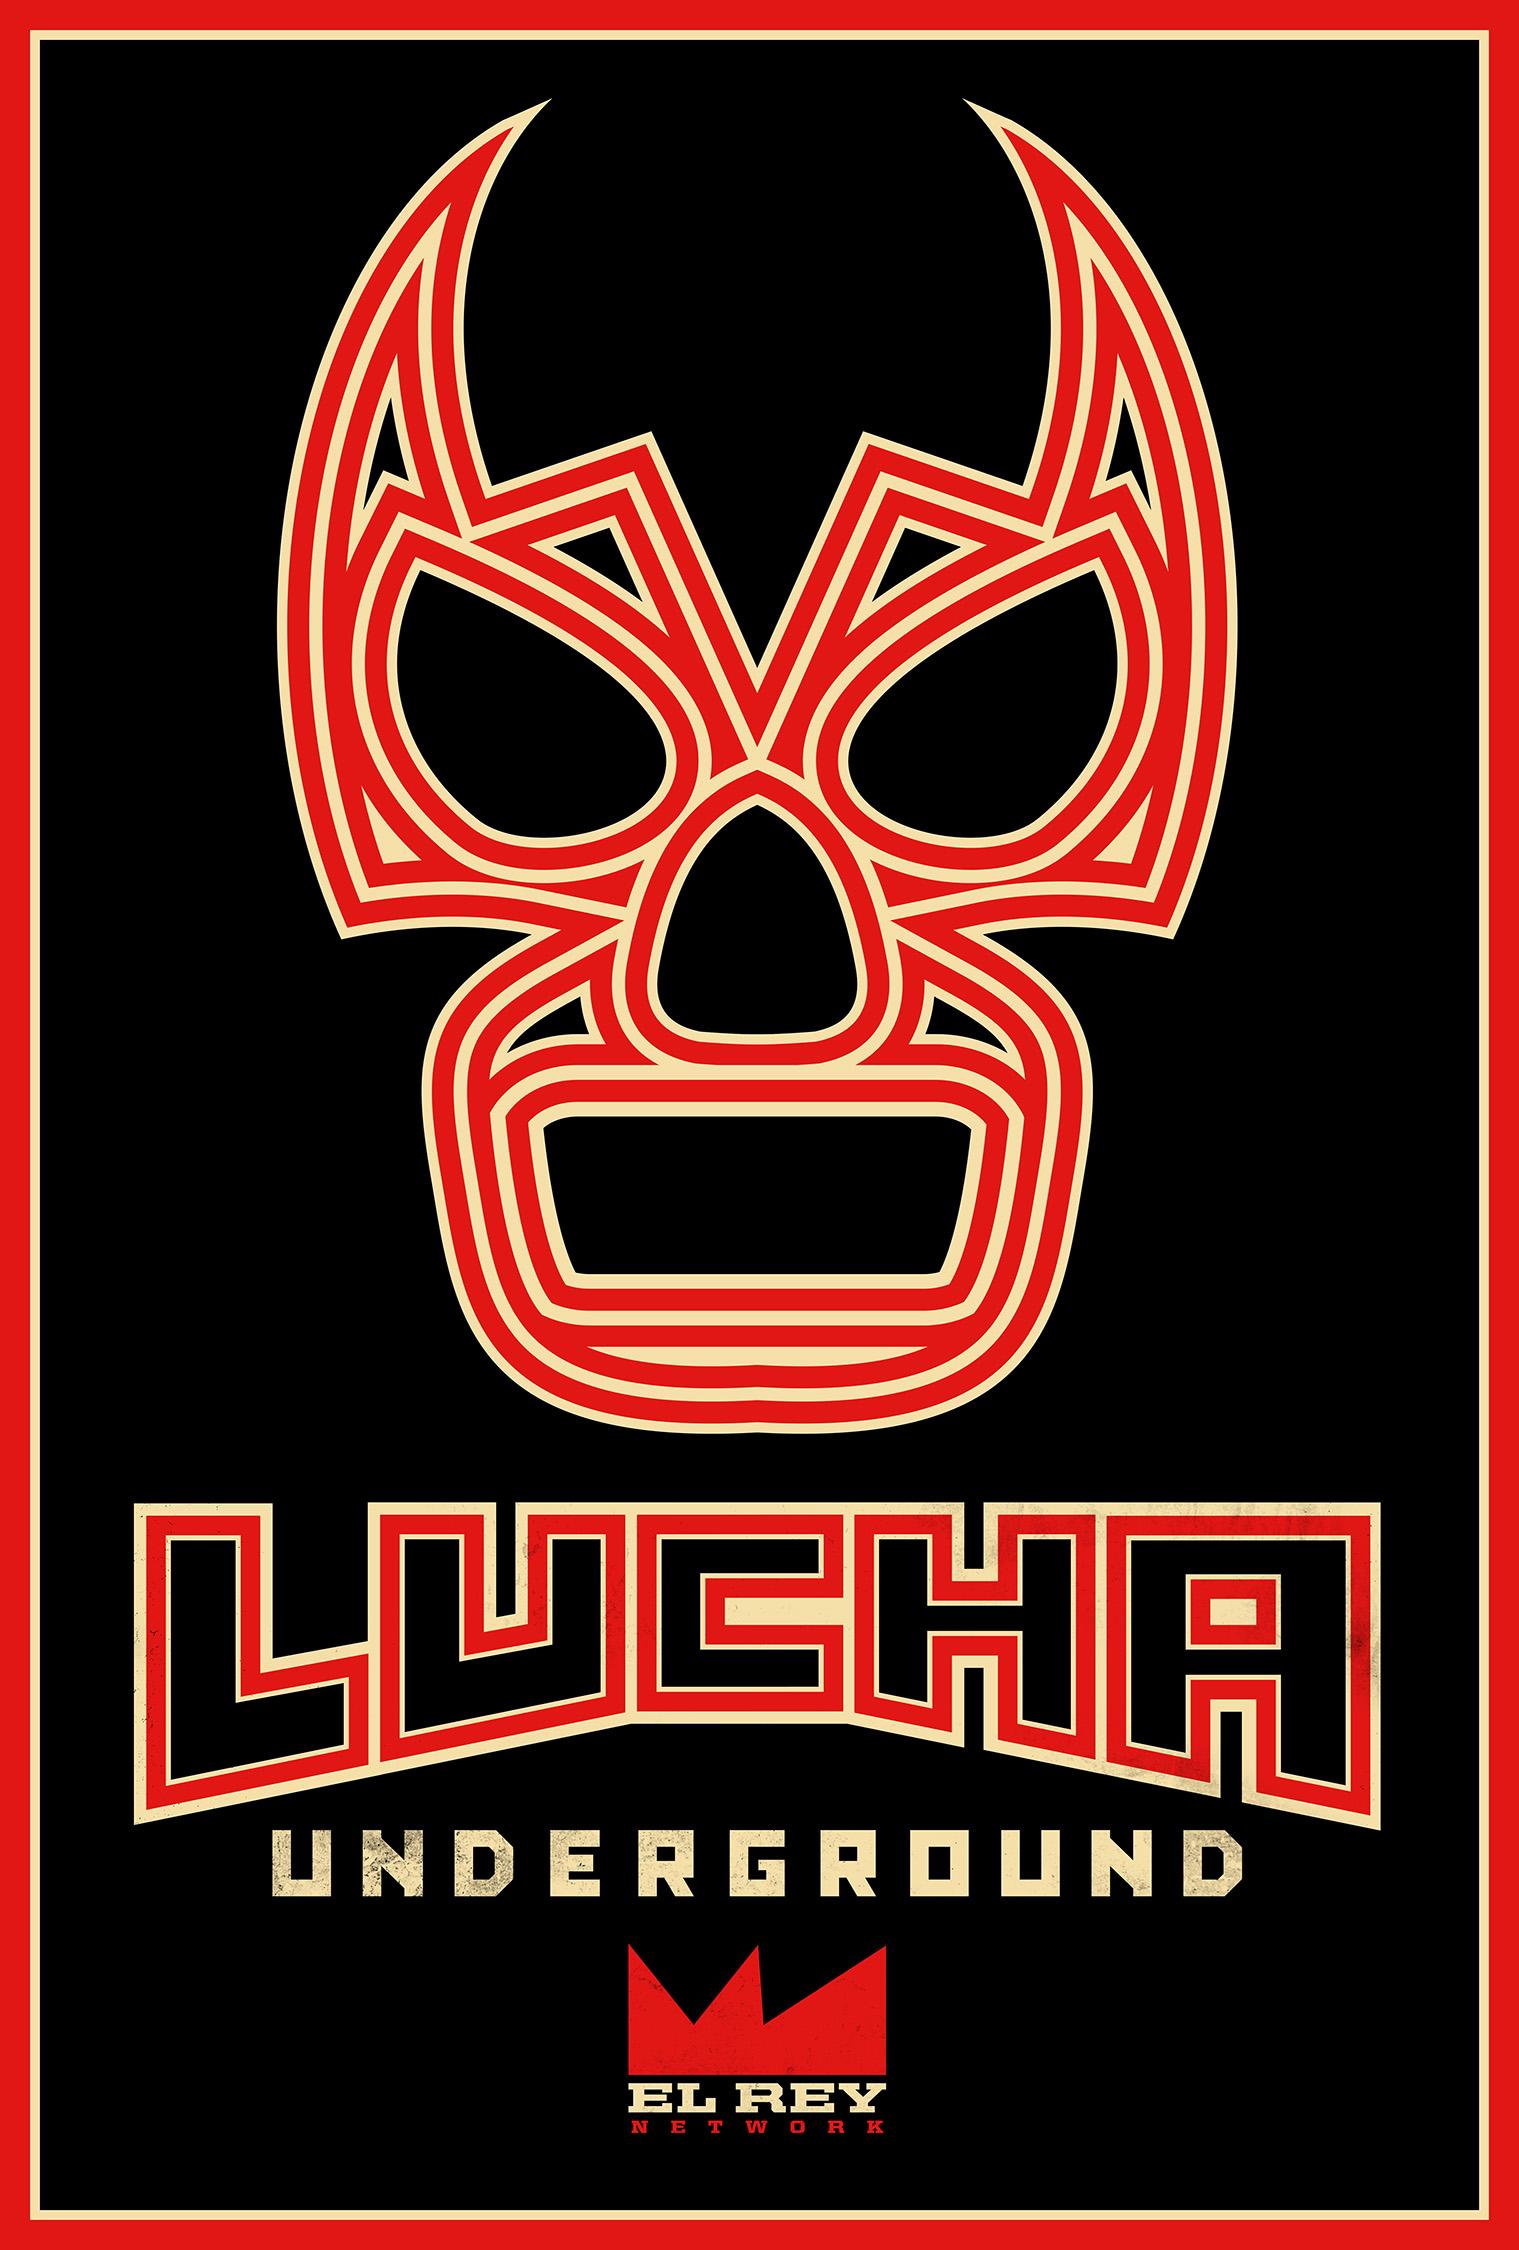 February 11, 2015 Lucha Underground results